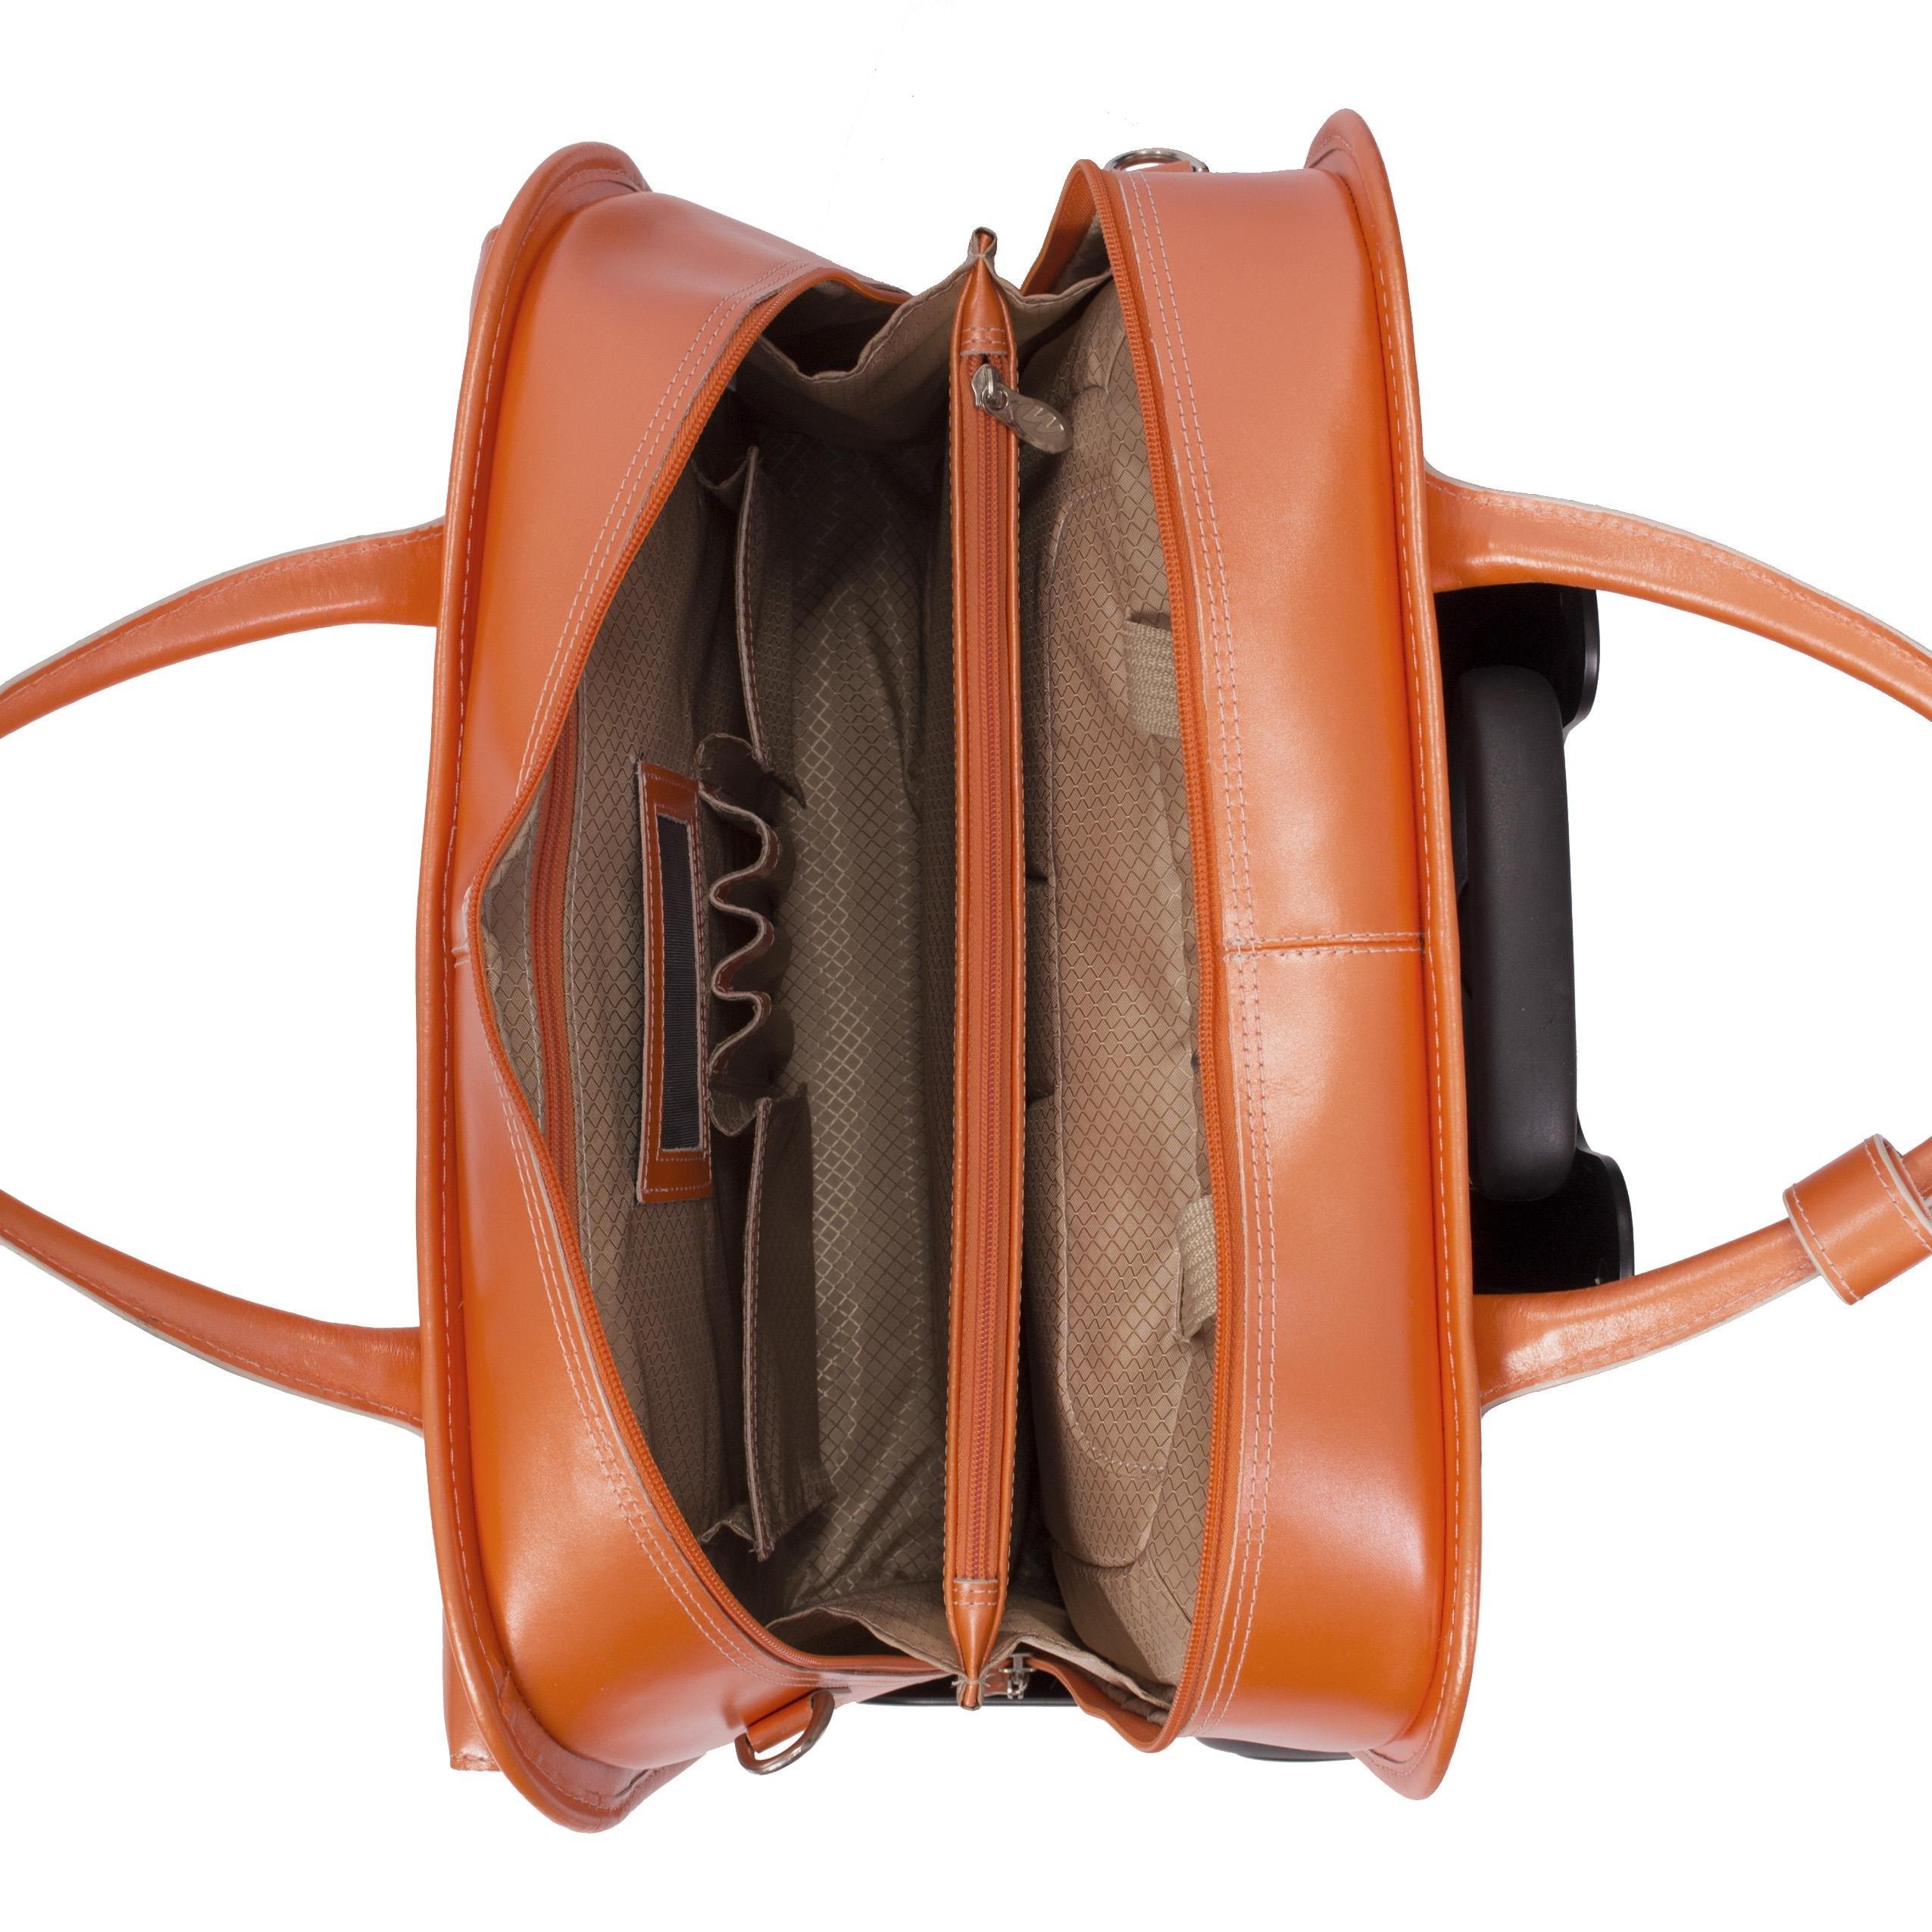 McKleinUSA LAKEWOOD 96615 Black Leather Fly-Through Checkpoint-Friendly Detachable-Wheeled Ladies' Briefcase by McKleinUSA (Image #1)